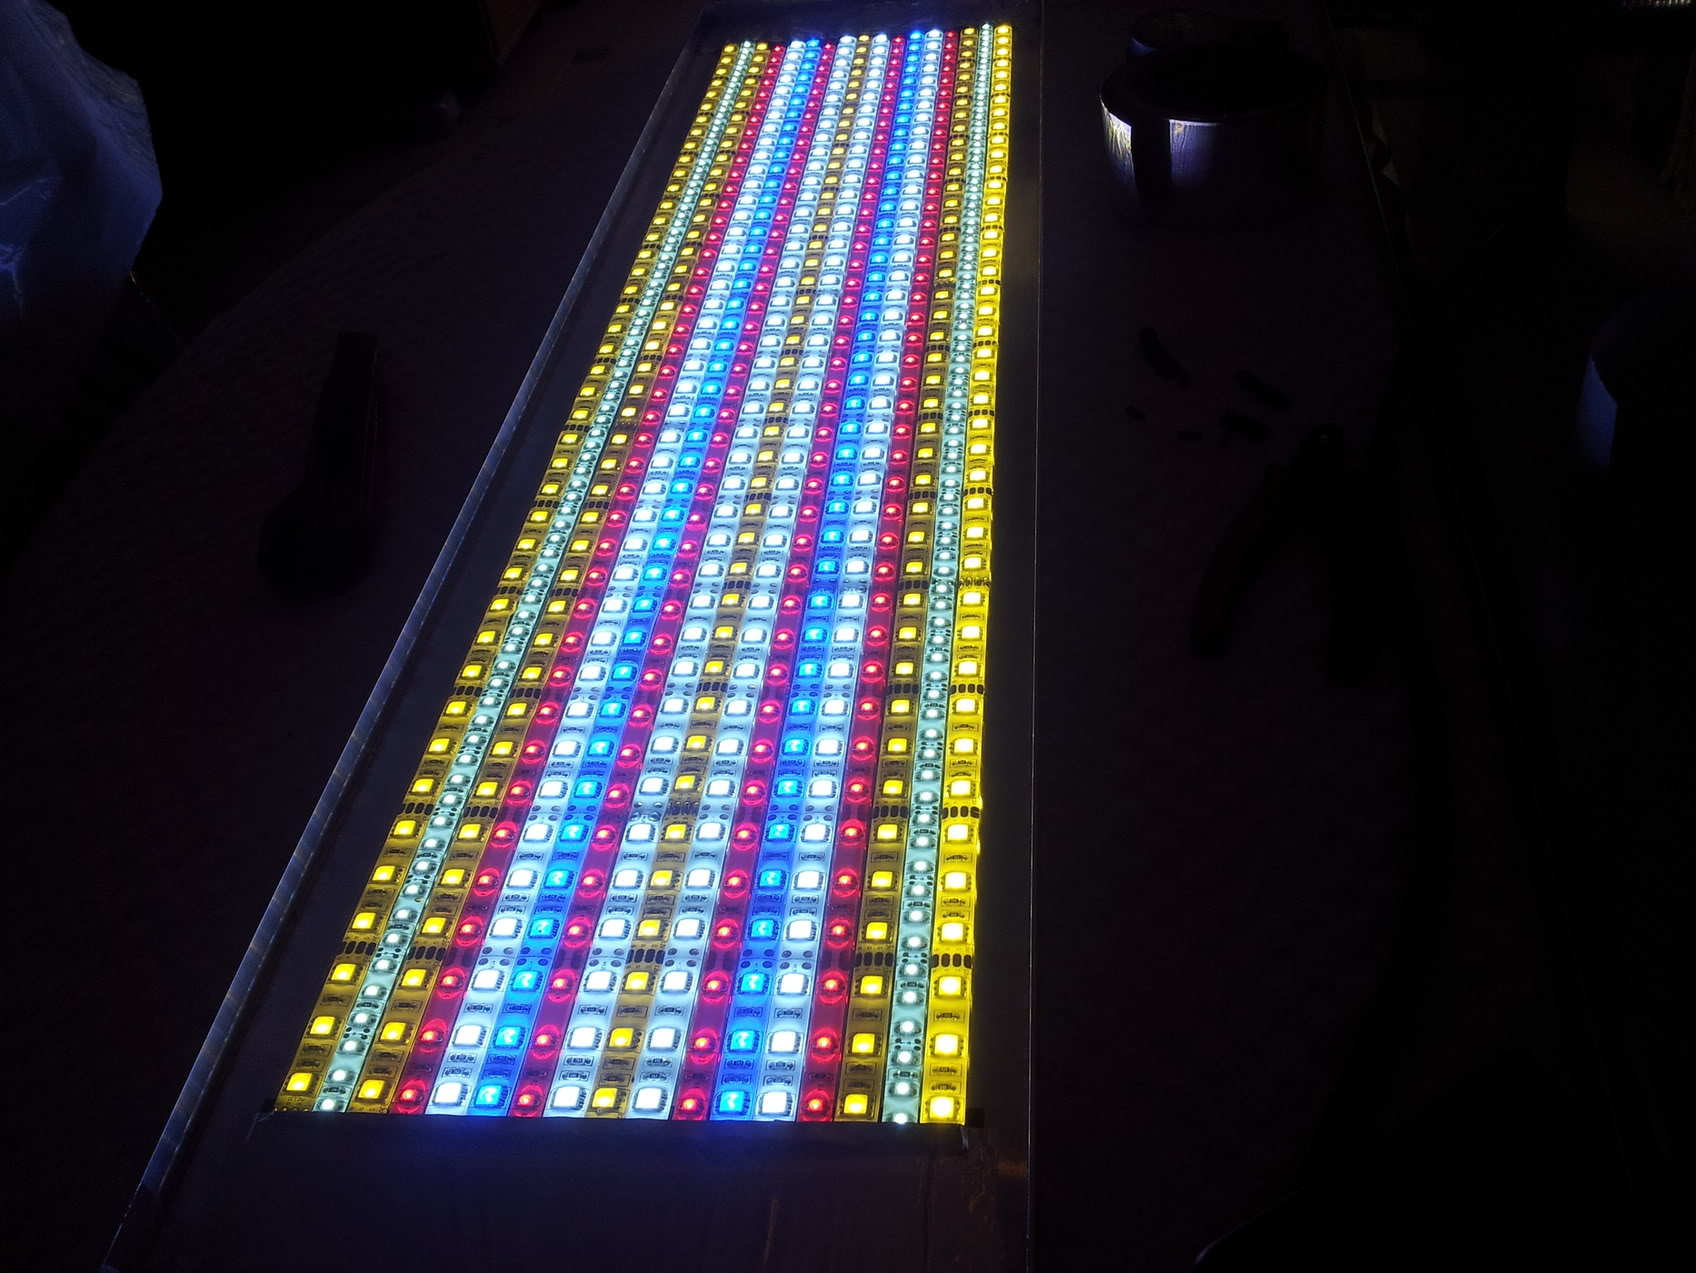 Fabrication galerie LED pour Juwel rio 125 (80cmx20cmx1.8cm) 20120715_152728